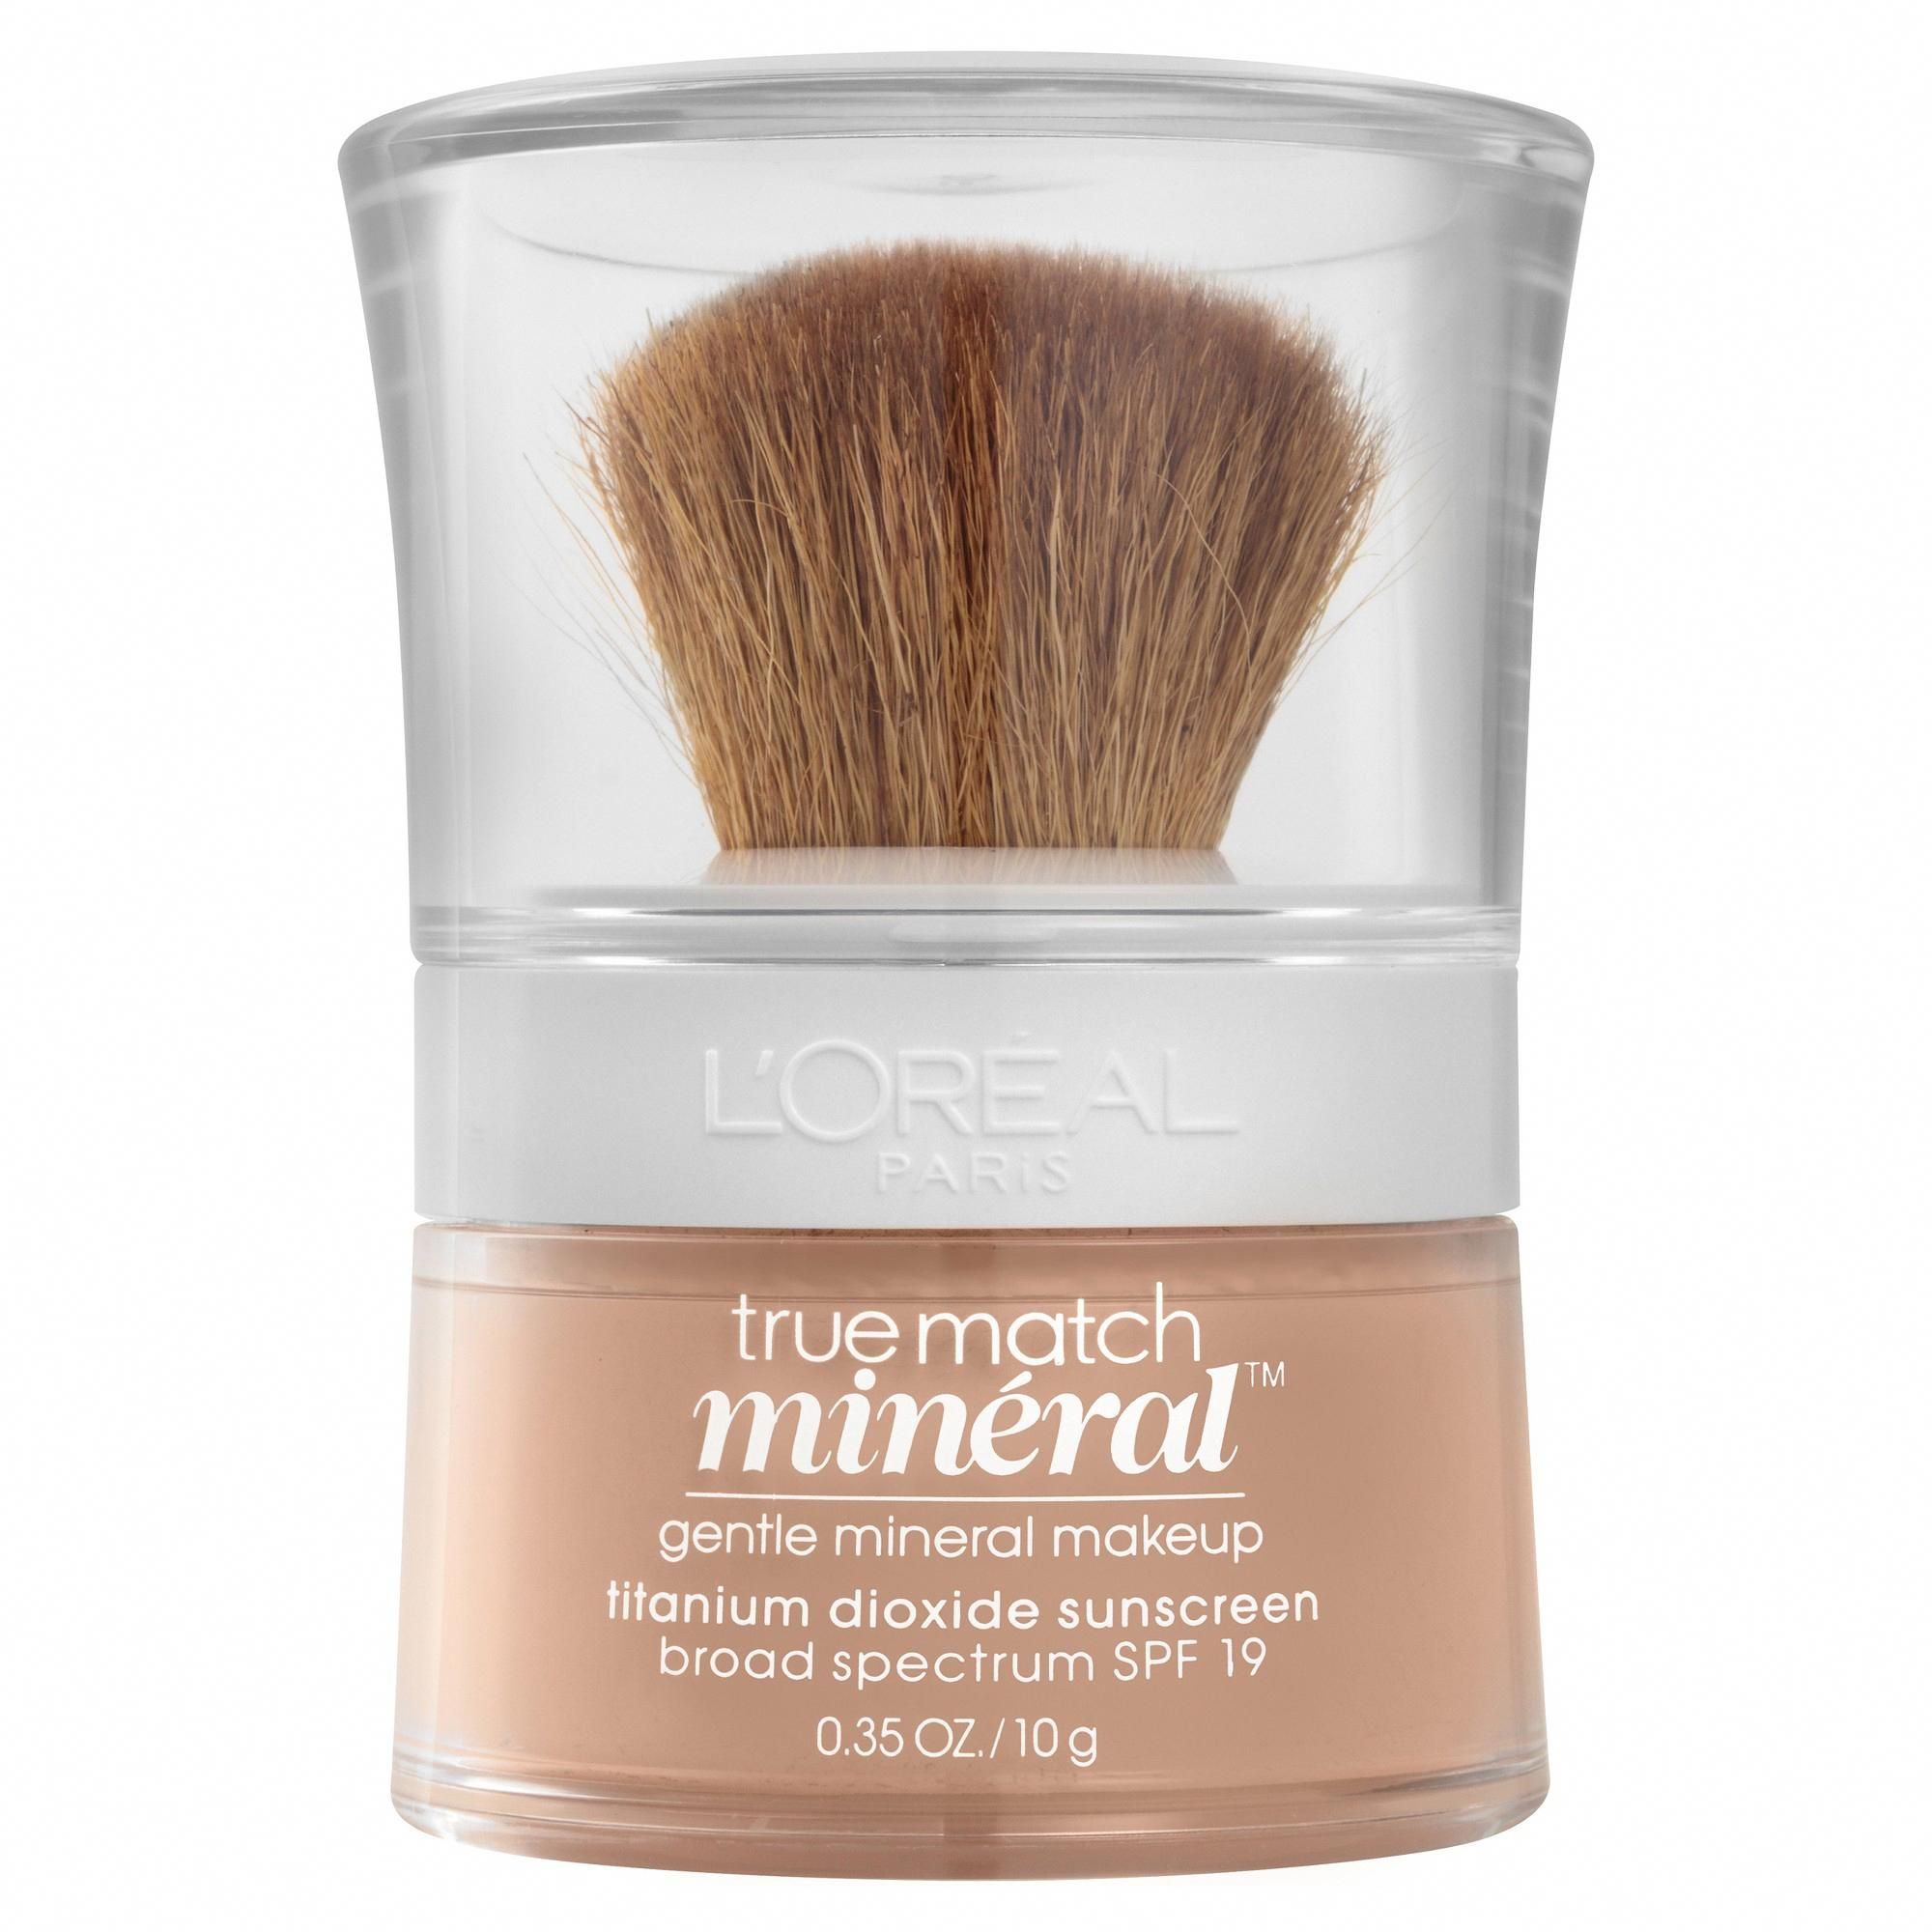 Newest makeup powder. foundationmakeuppowder Mineral